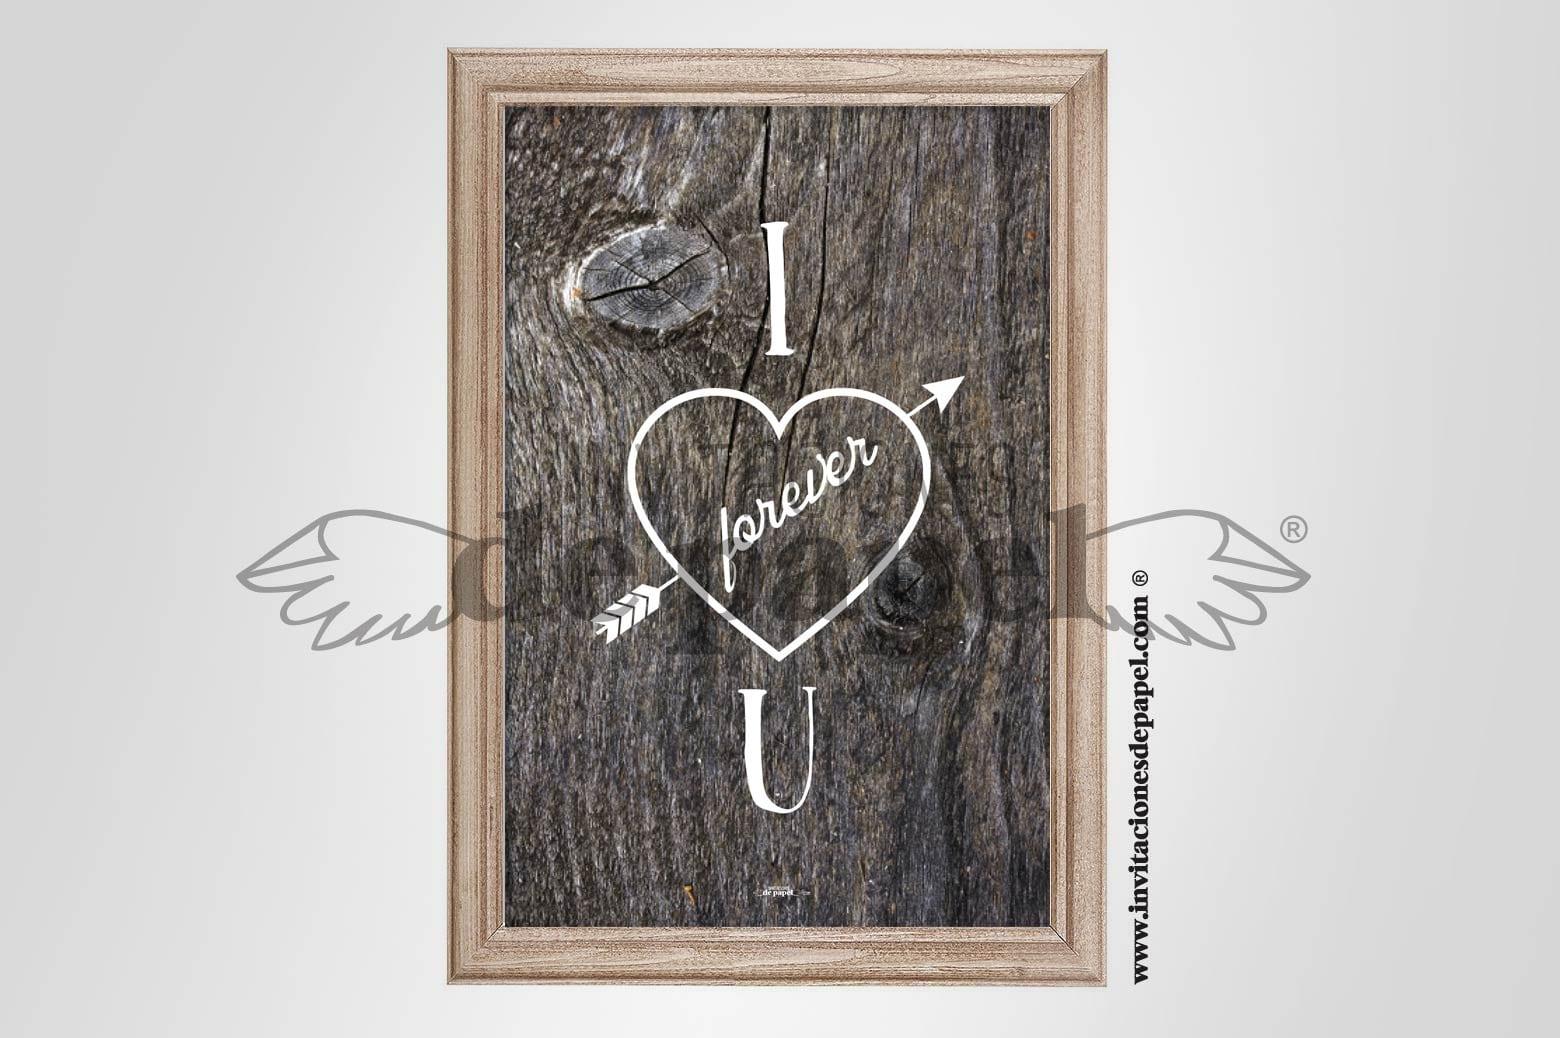 Lamina con Mensaje o Frase de Amor para tu Pareja Regalo Romantico - tronco de arbol